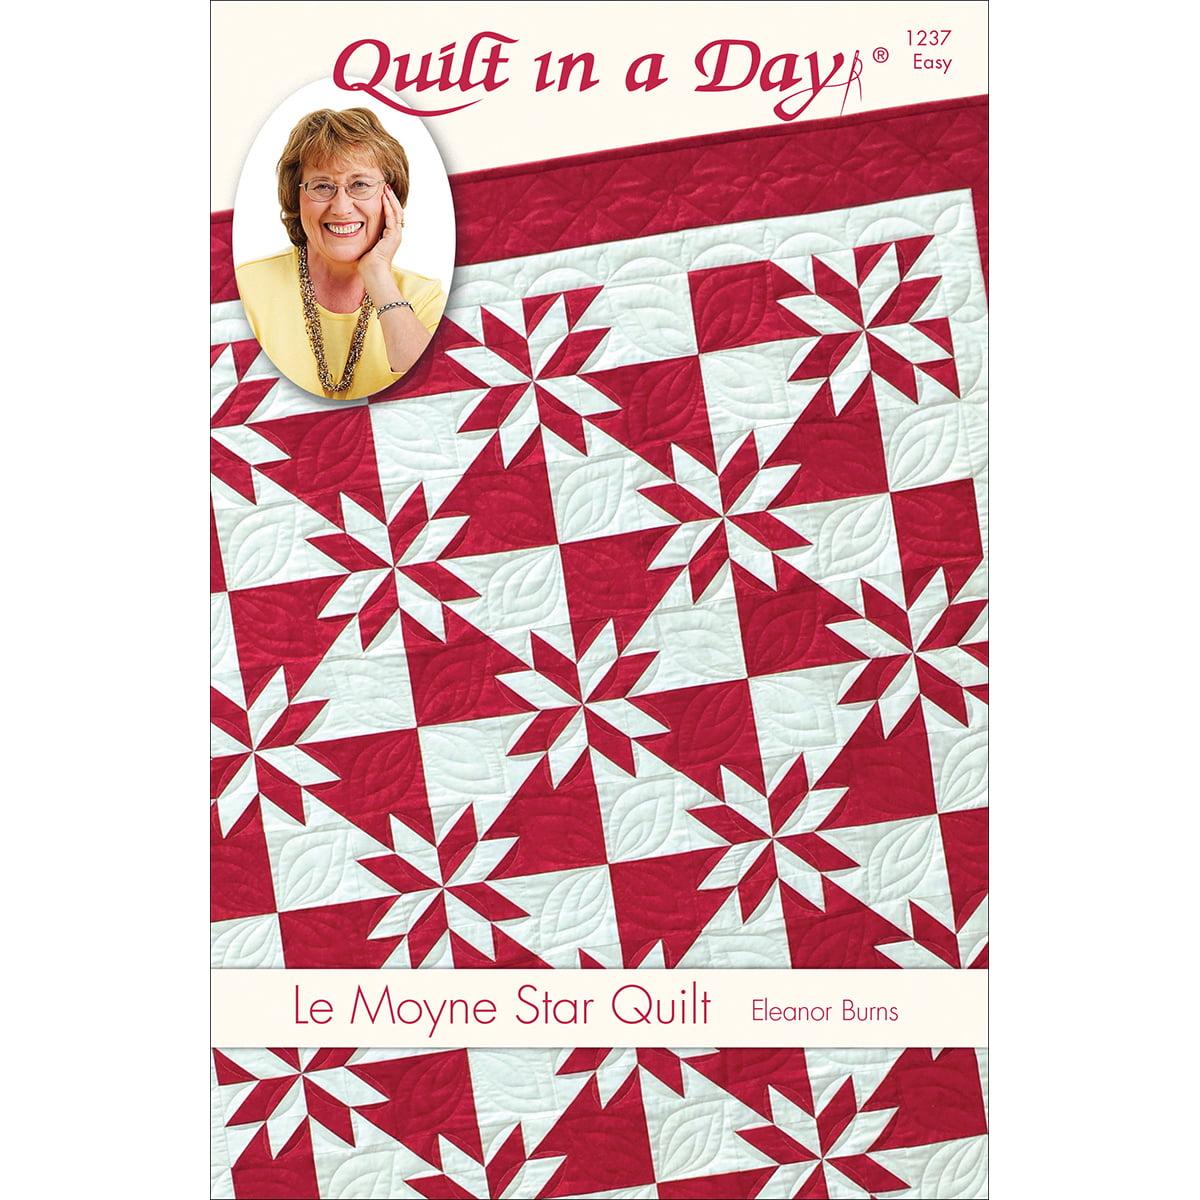 Eleanor Burns Patterns-Le Moyne Star Quilt